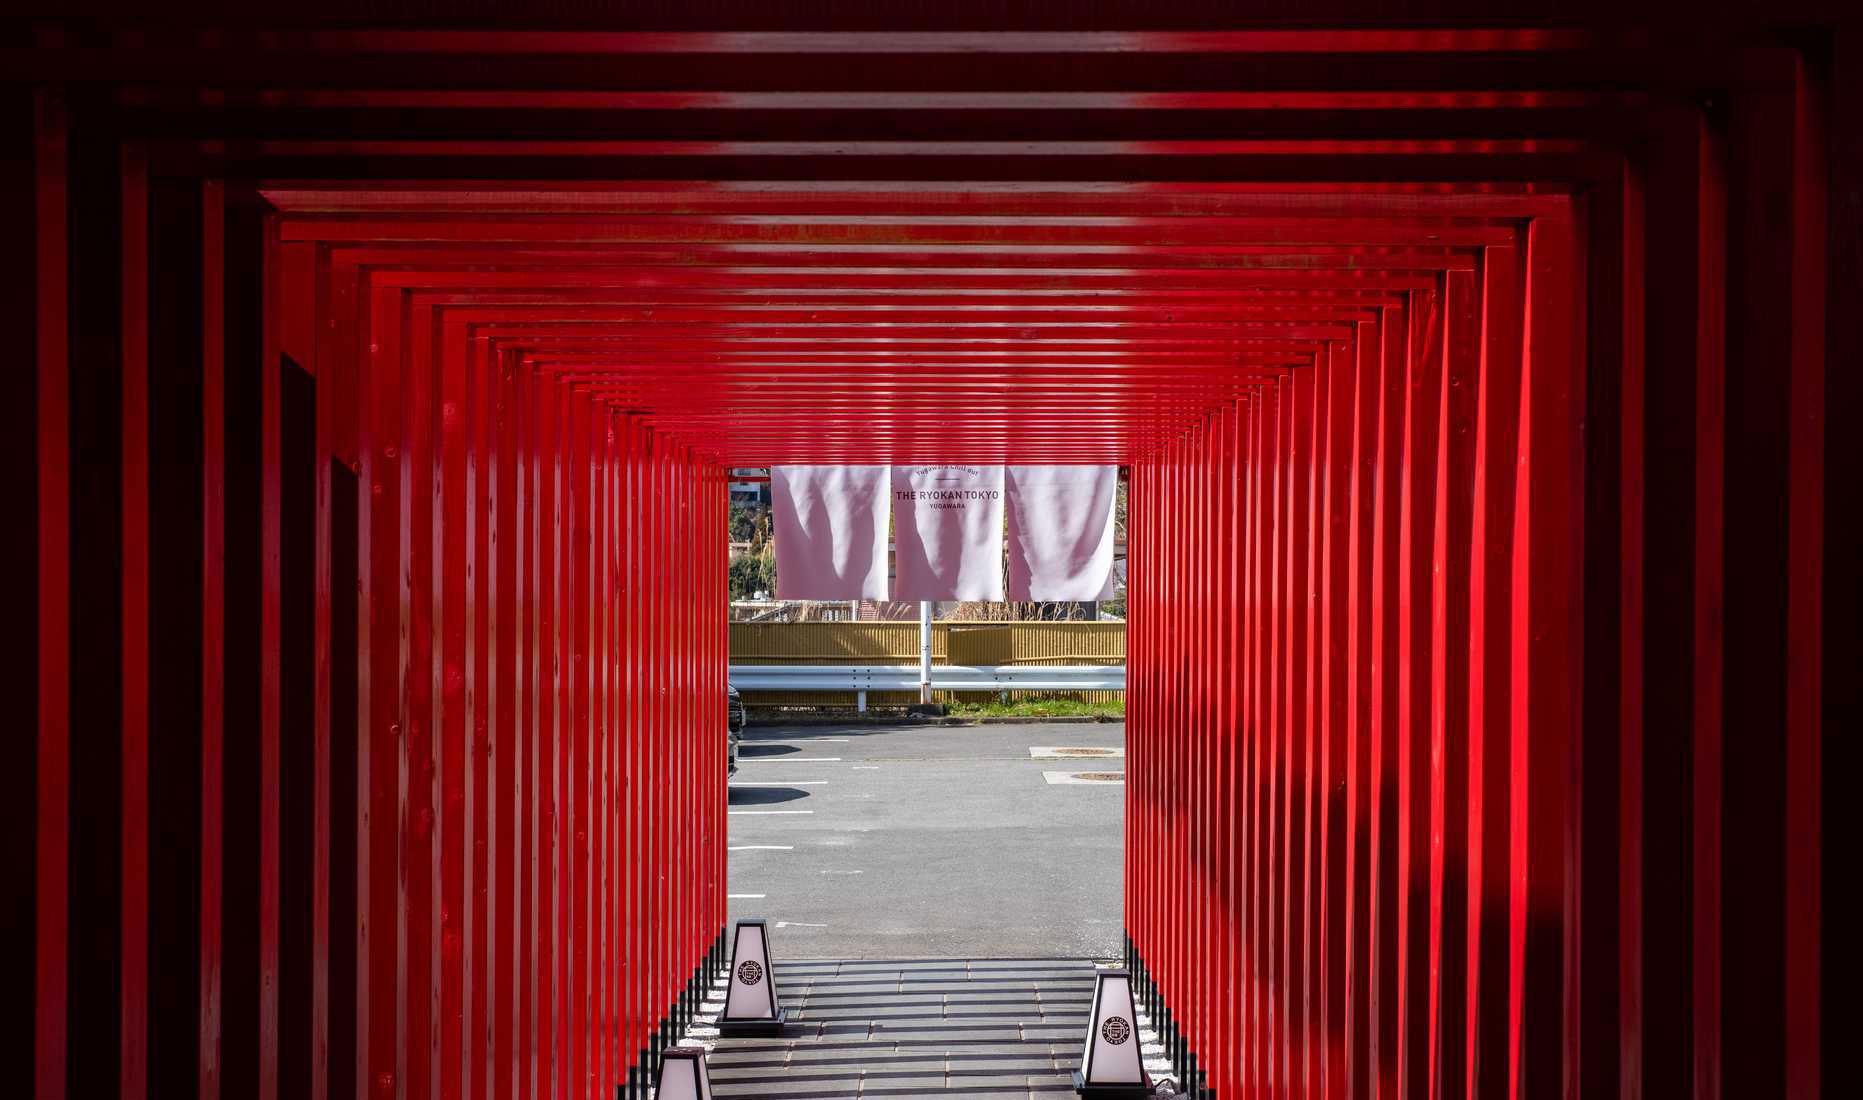 The Ryokan Tokyo Yugawaraの入り口